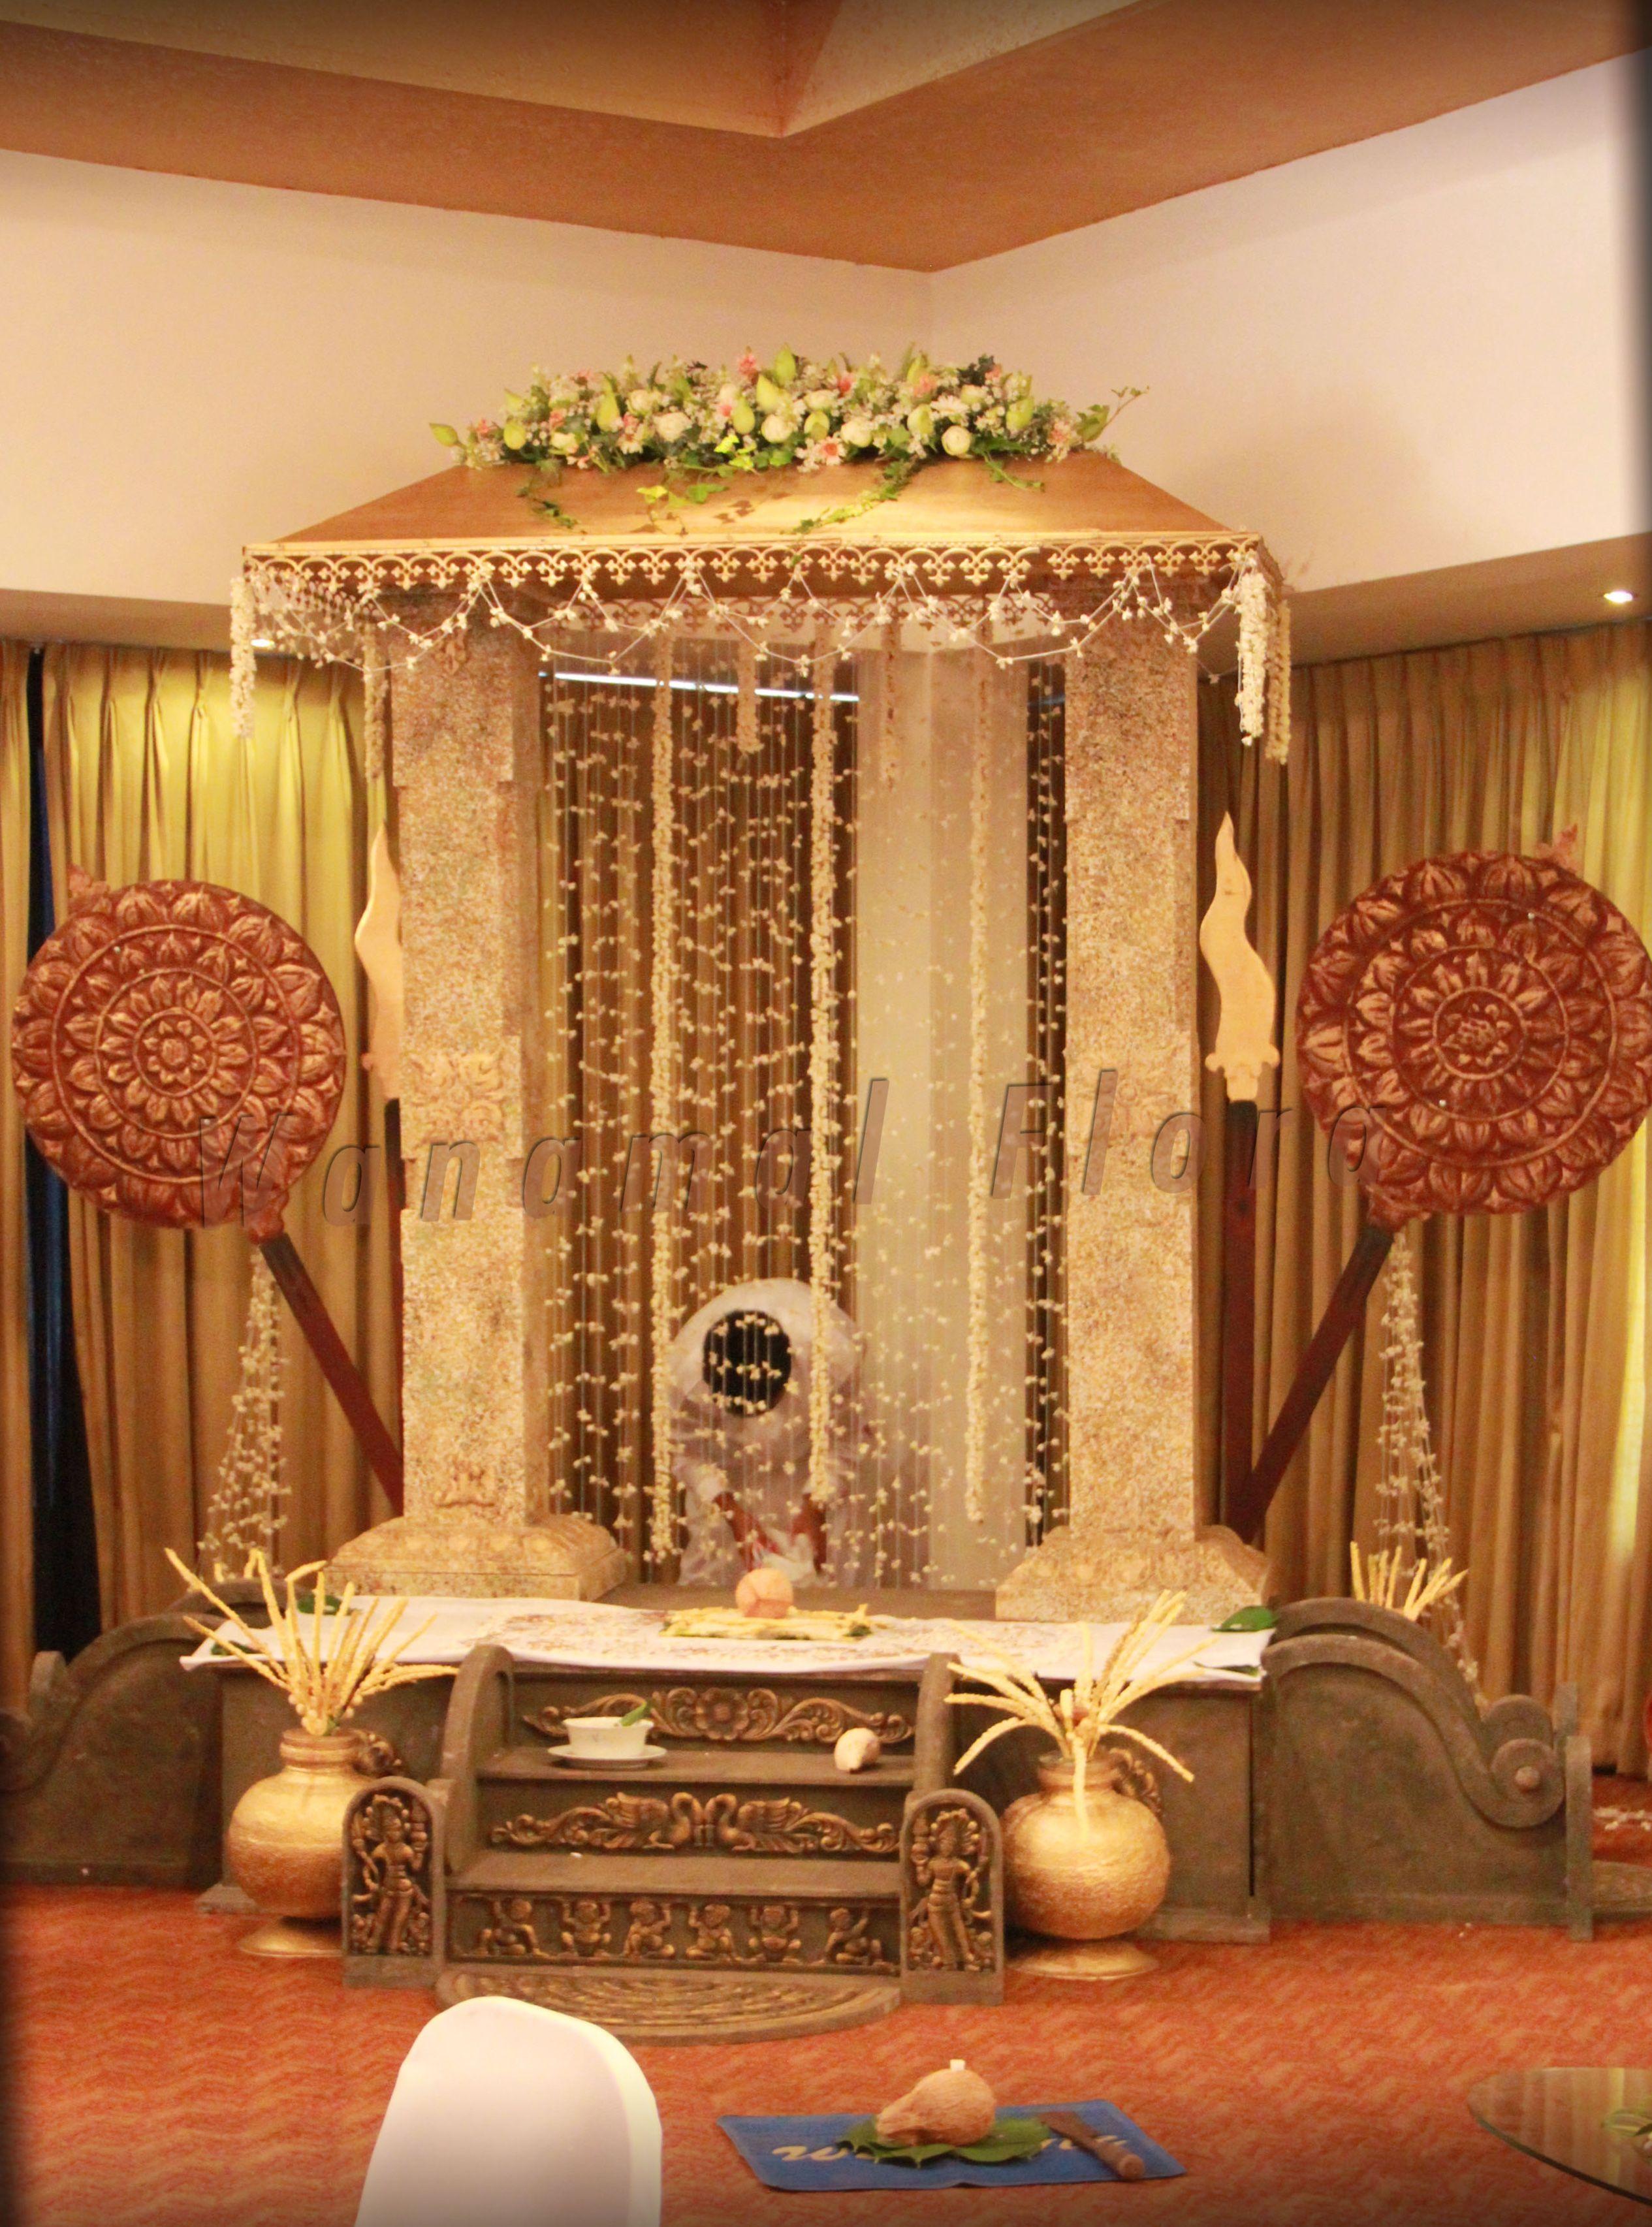 Wanamal Poruwa Decor Traditional Wedding Decor Wedding Deco Flower Decoration For Ganpati